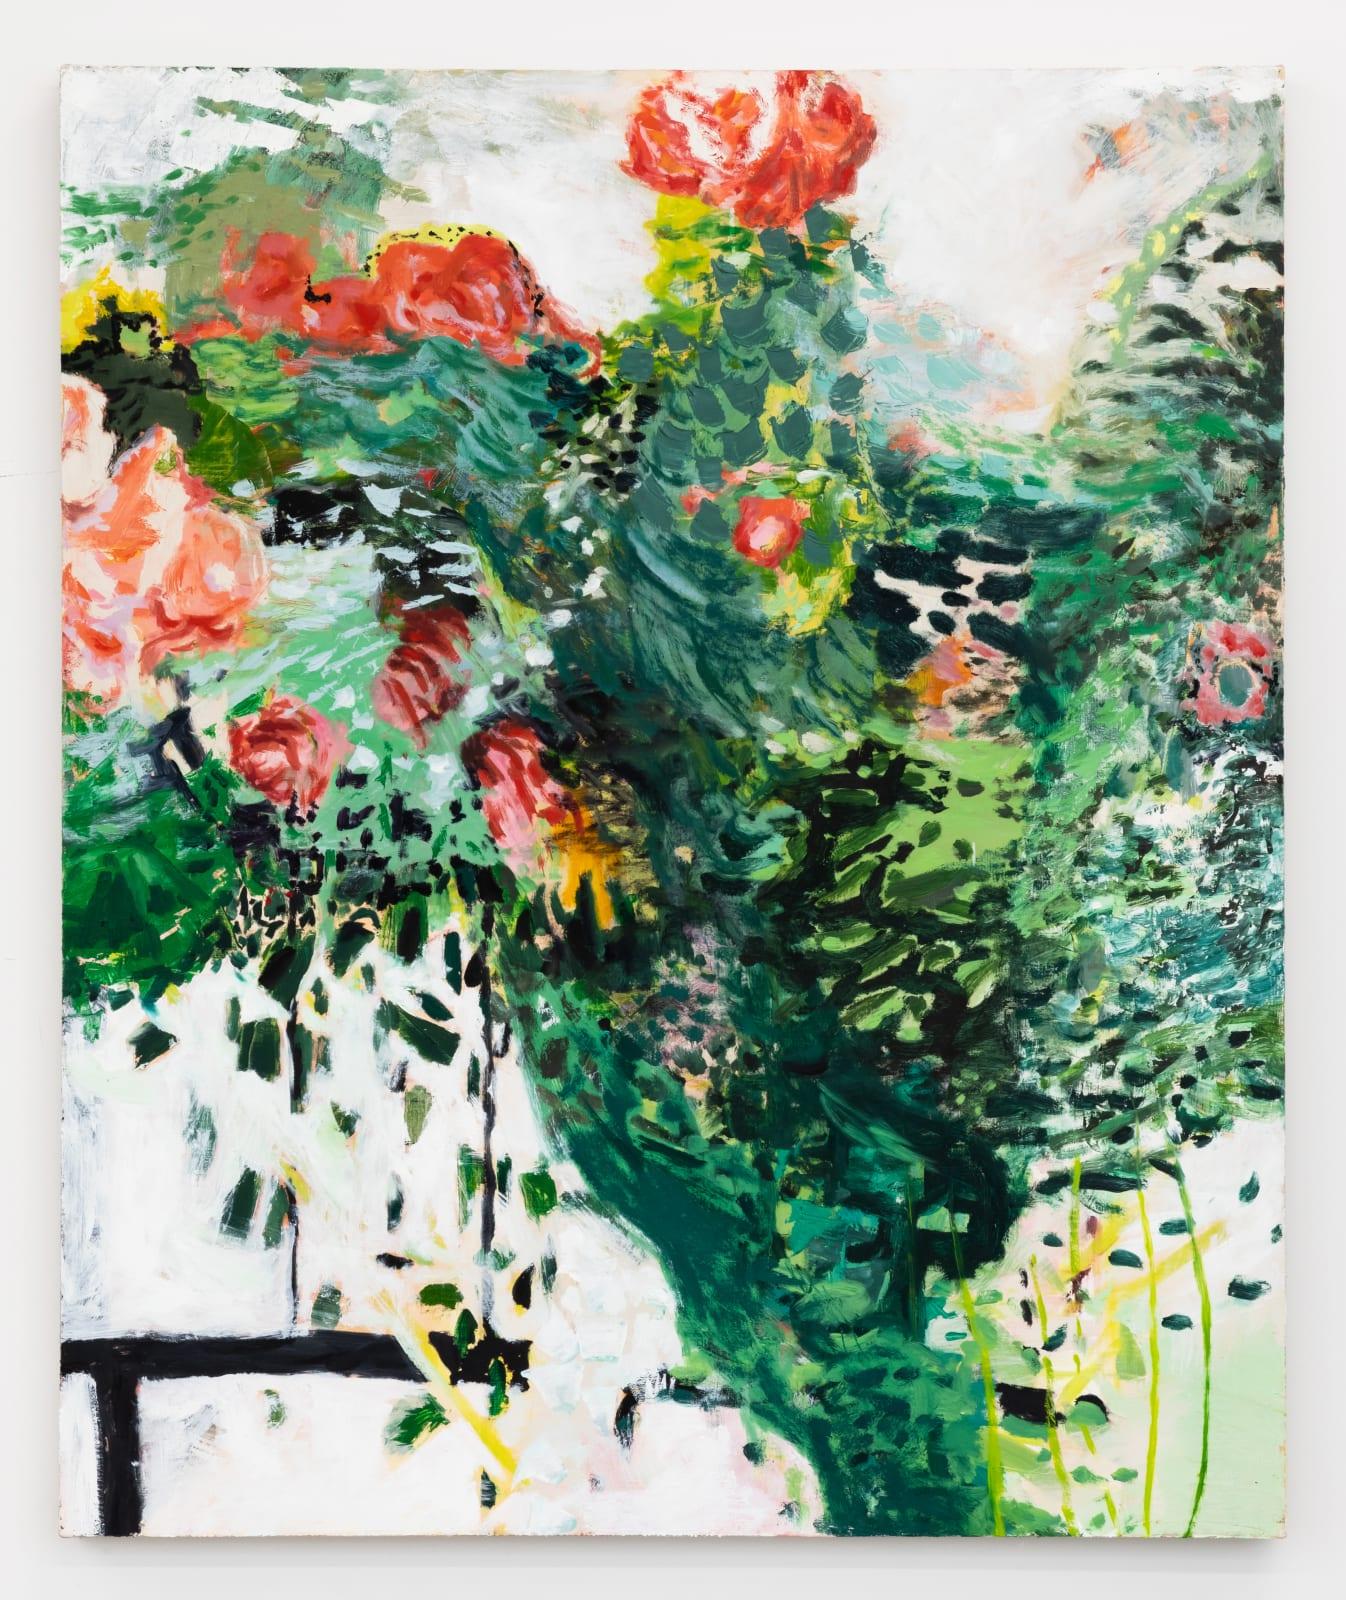 Lumin Wakoa, roses (front garden), 2021